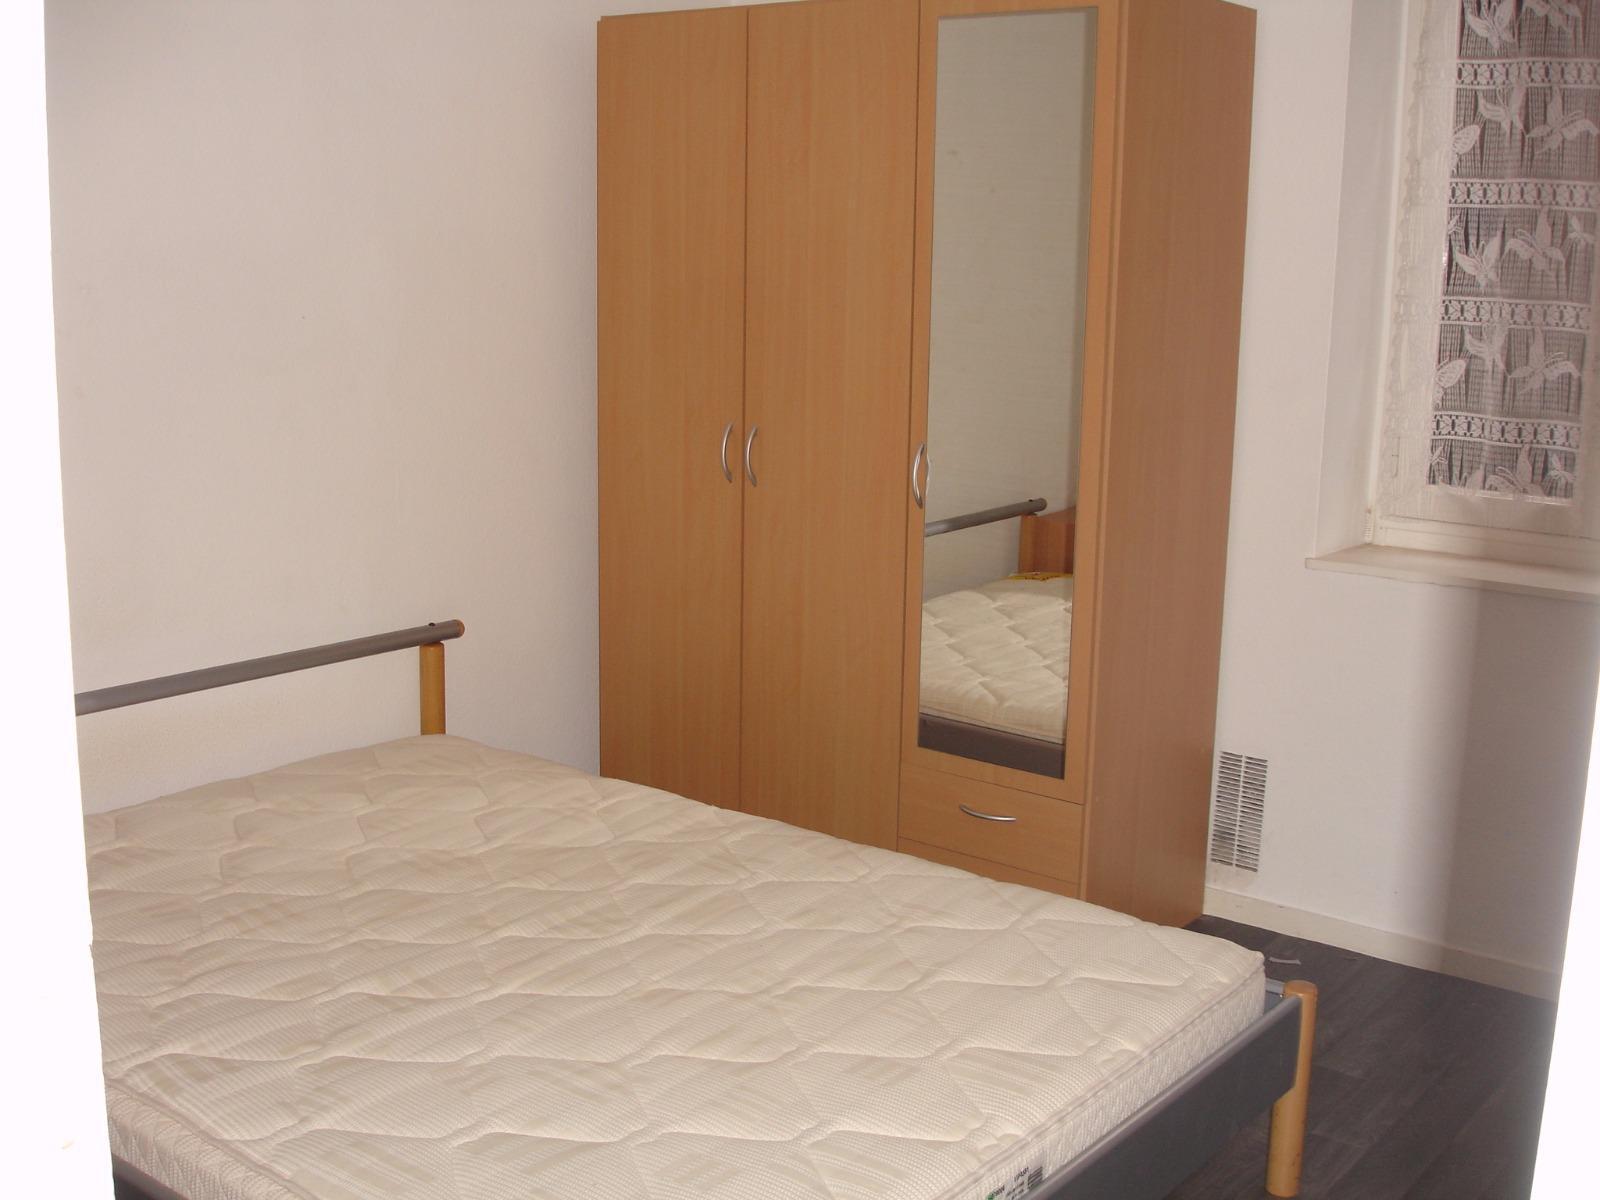 location t2 meuble jean pouyat rdc g. Black Bedroom Furniture Sets. Home Design Ideas